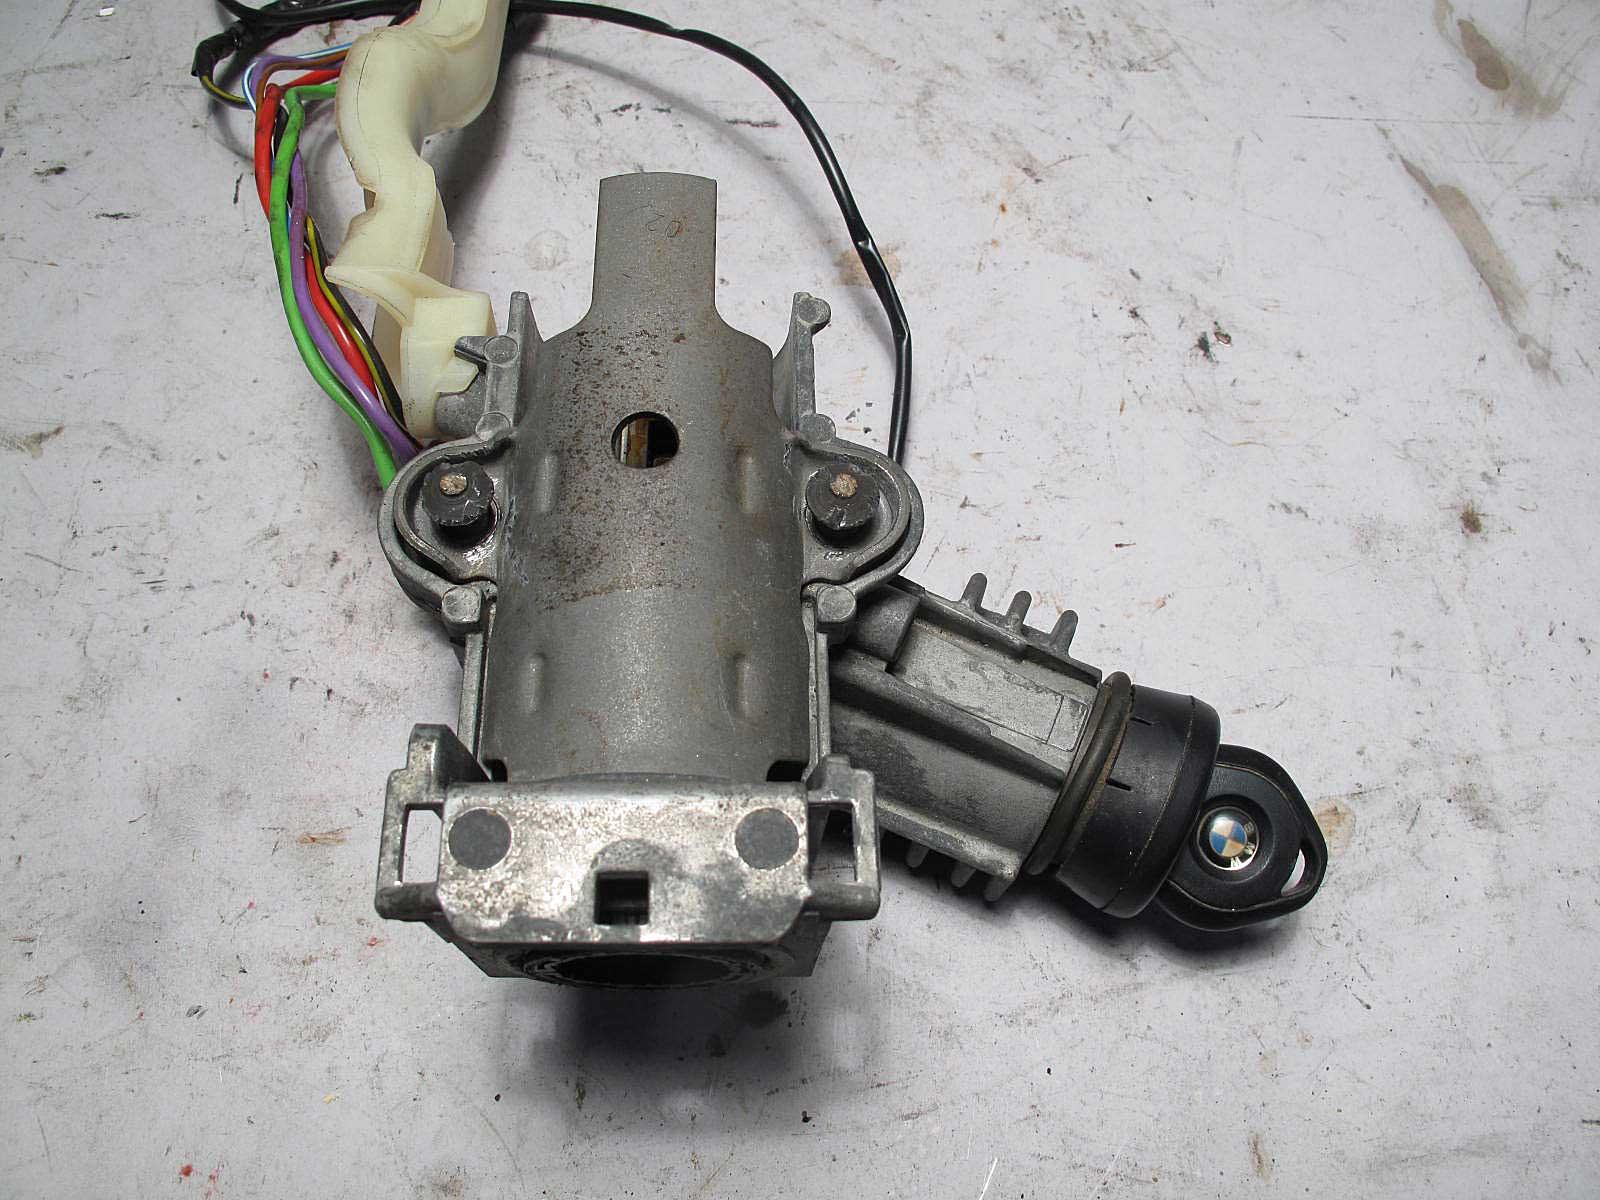 1999 Saab 9 3 Speaker Wiring Further 2003 Saab 9 3 Ignition Wiring